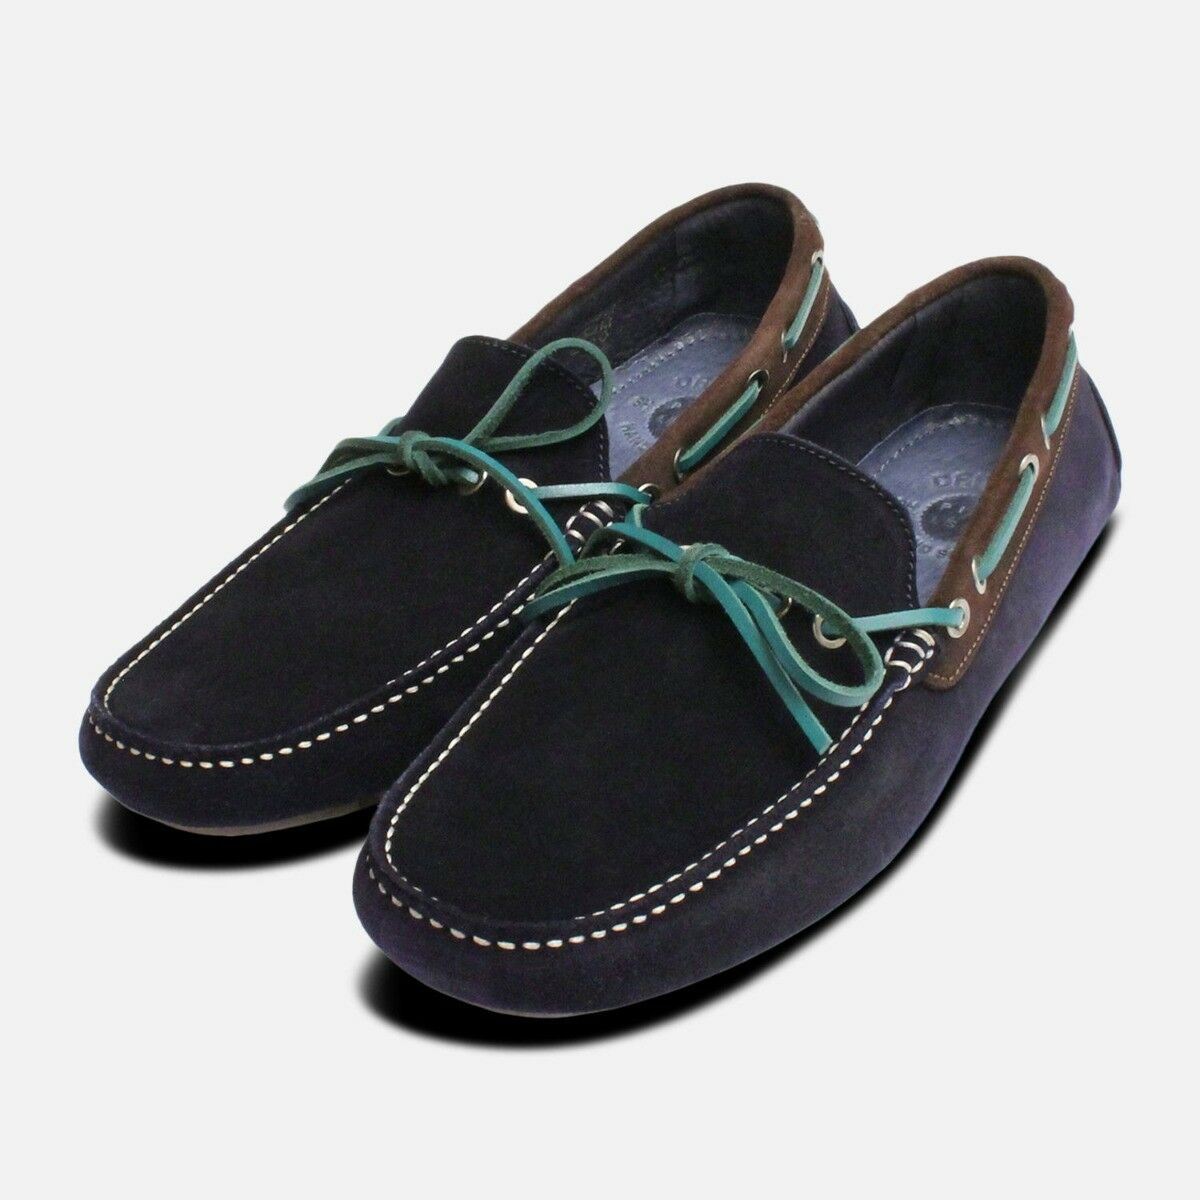 Navy bluee & Green Designer Driving shoes